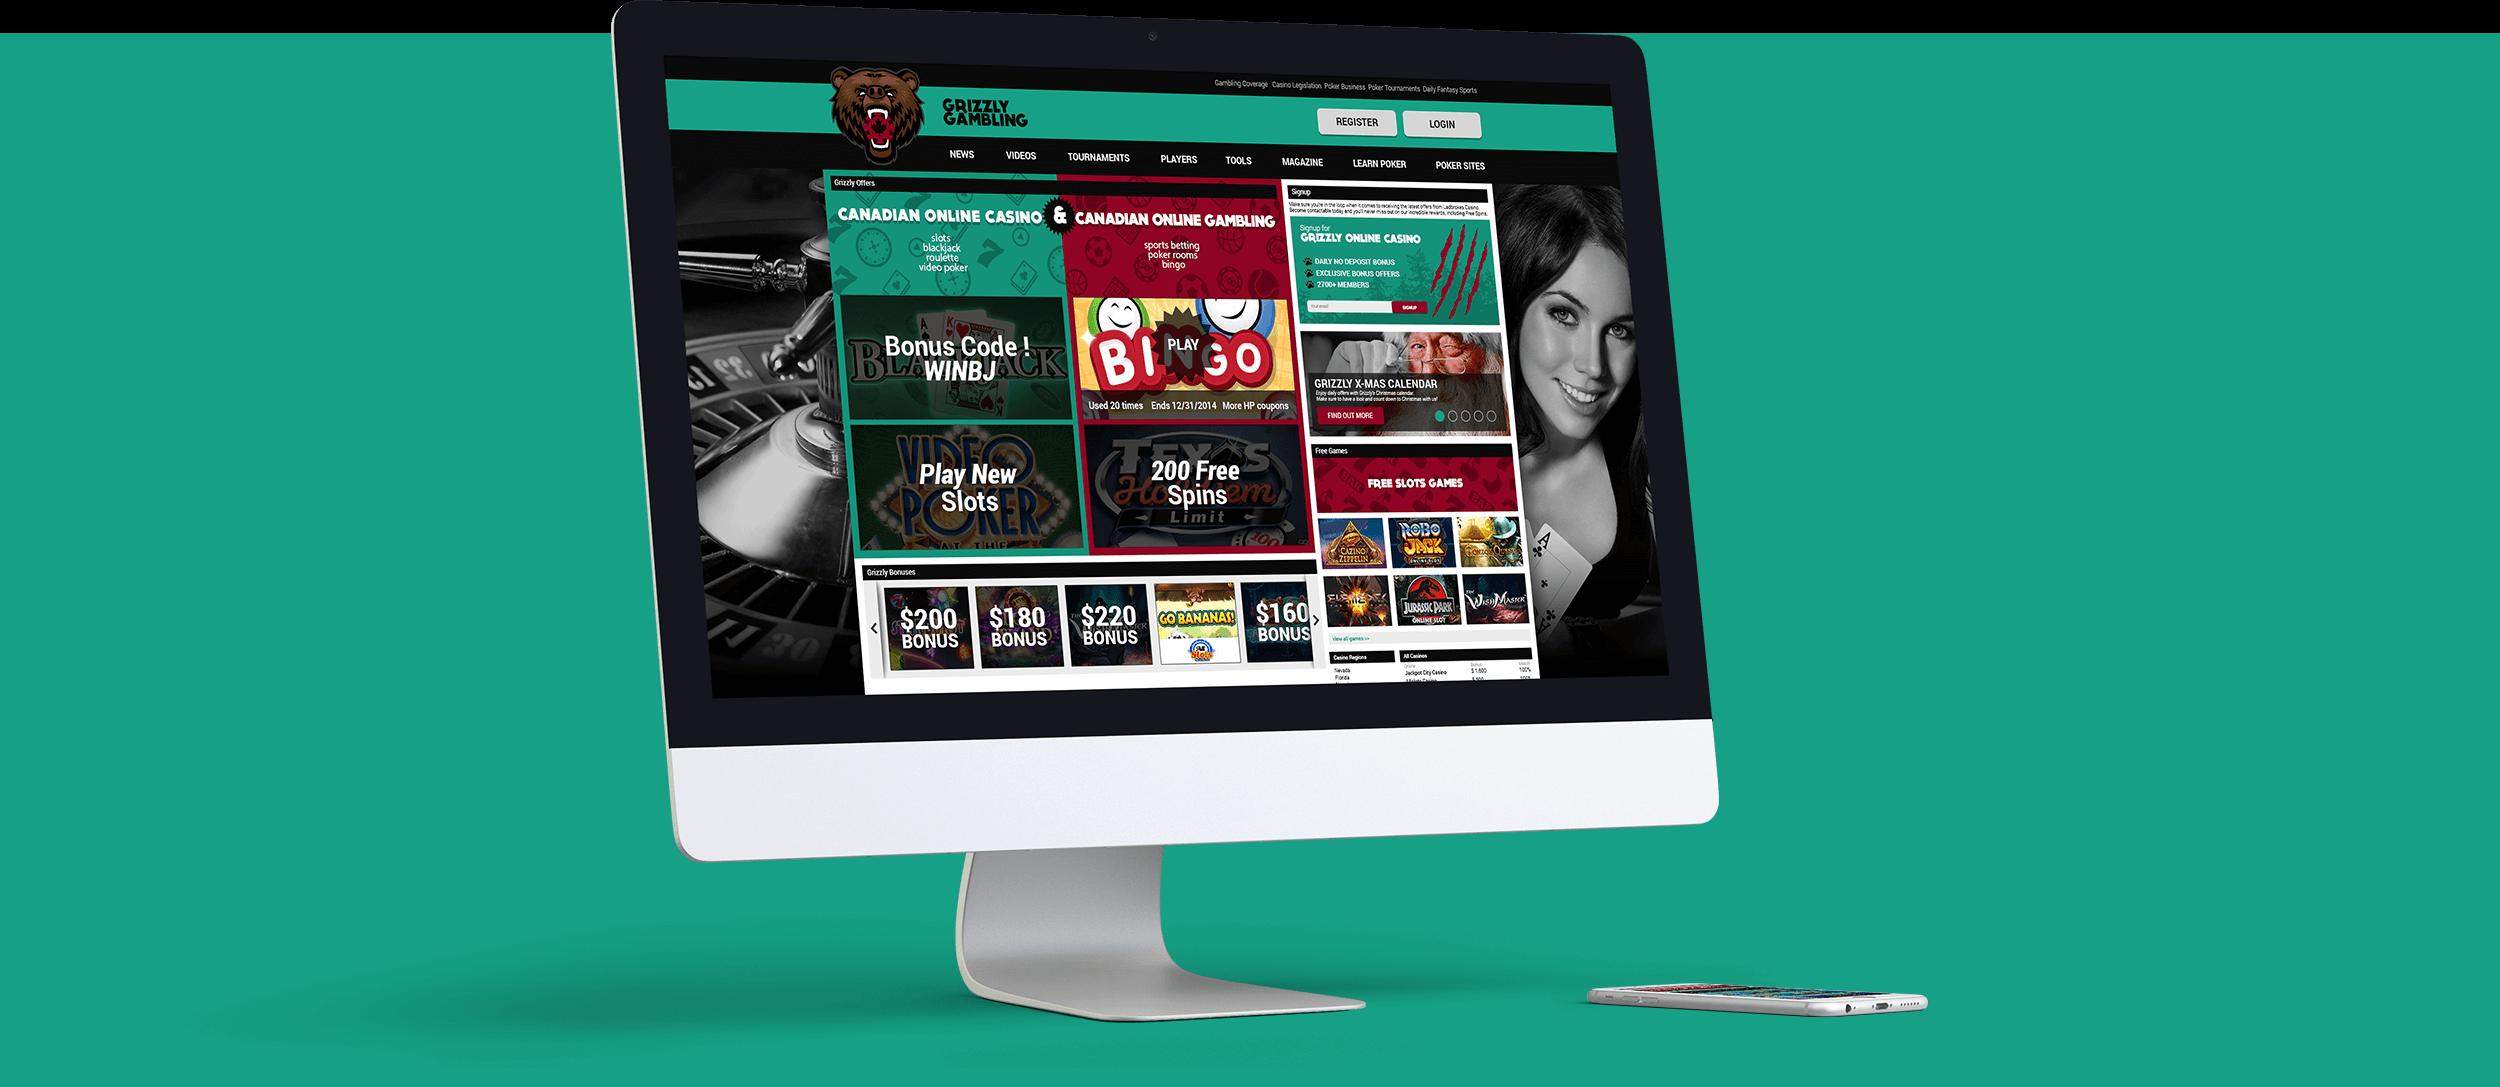 online casino usa no deposit